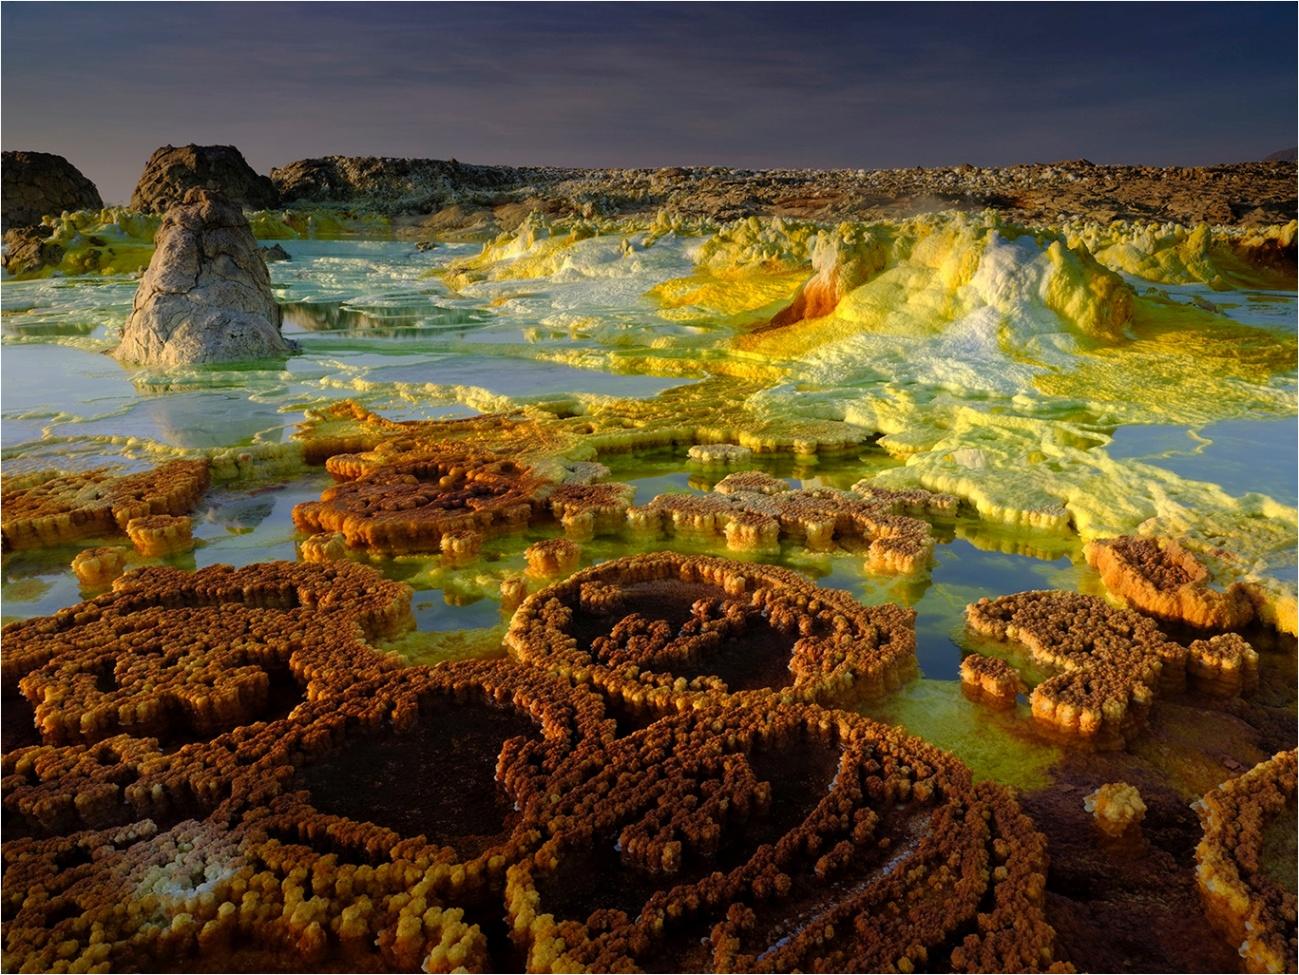 Sistema hidrotermal de Dallol, en Etiopía. Imagen: Olivier Grunewald / CSIC